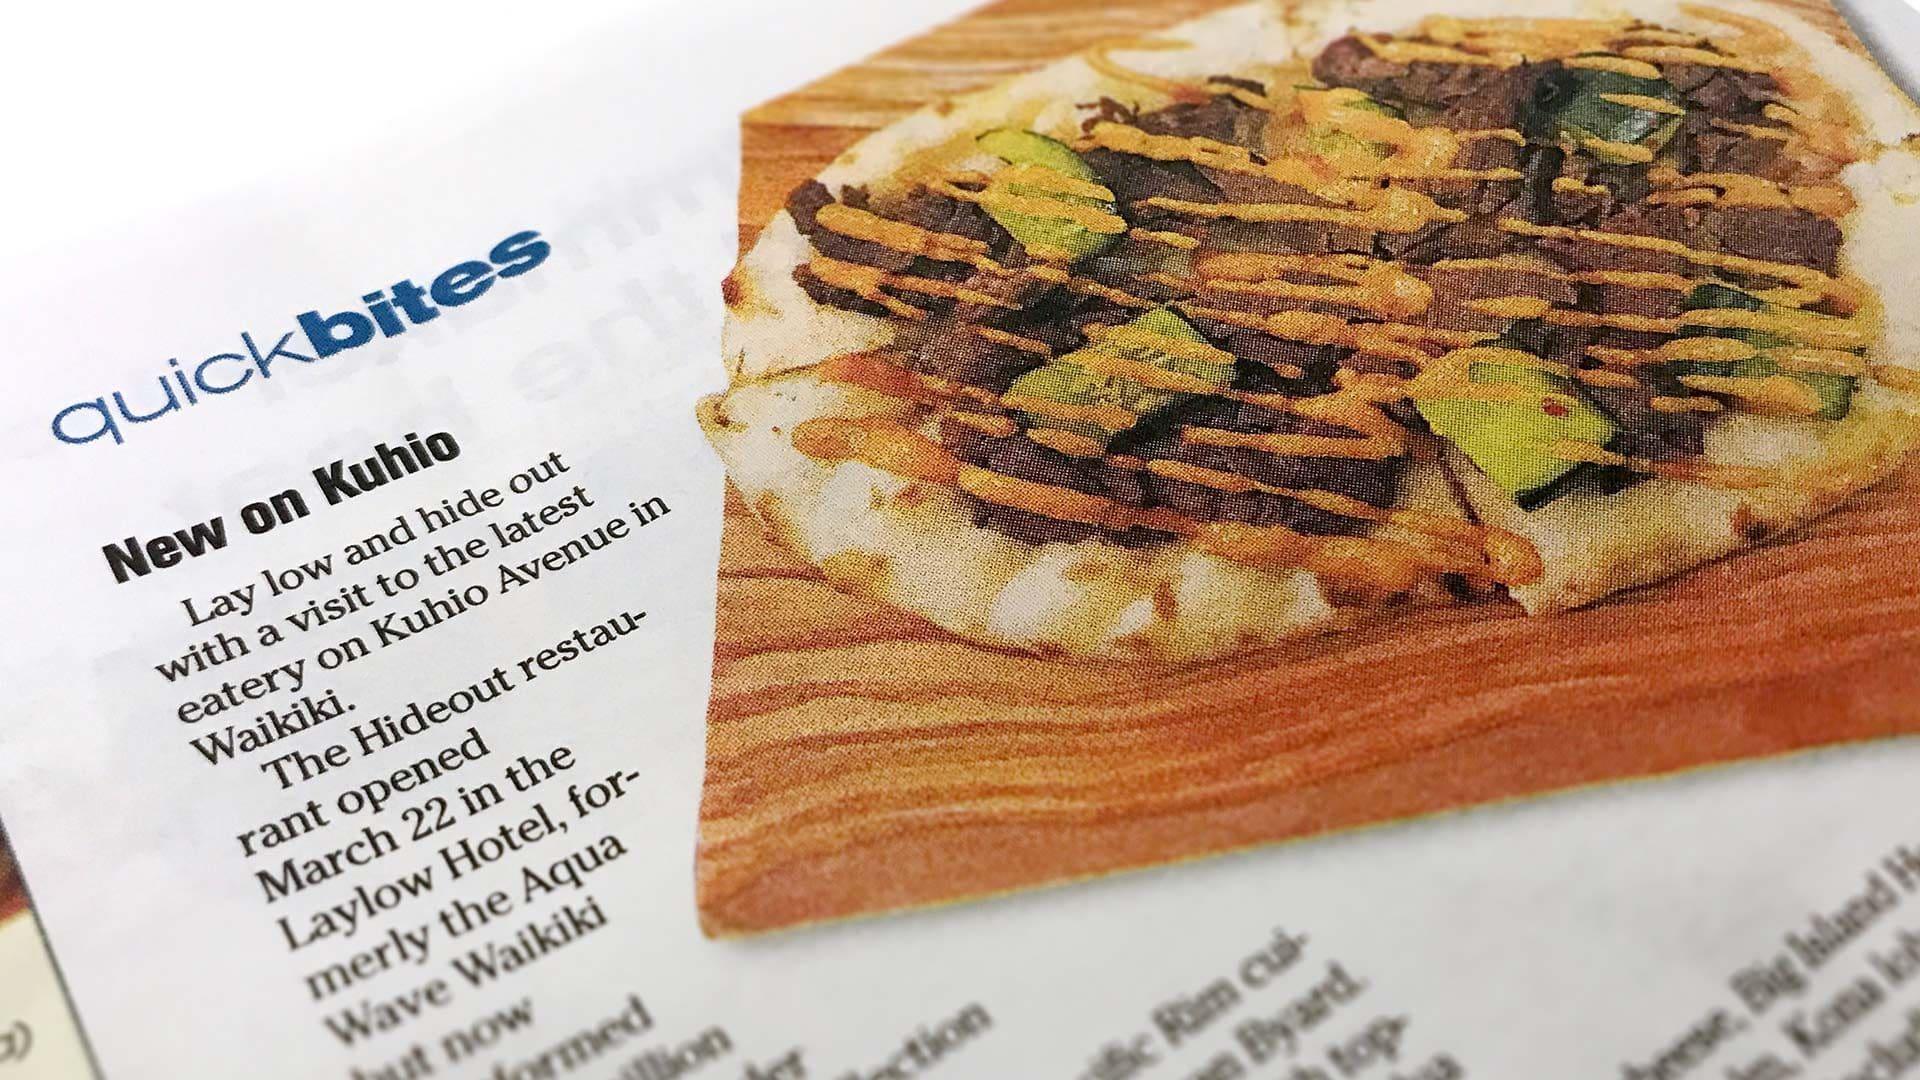 The LayLow Waikiki Newspaper Article